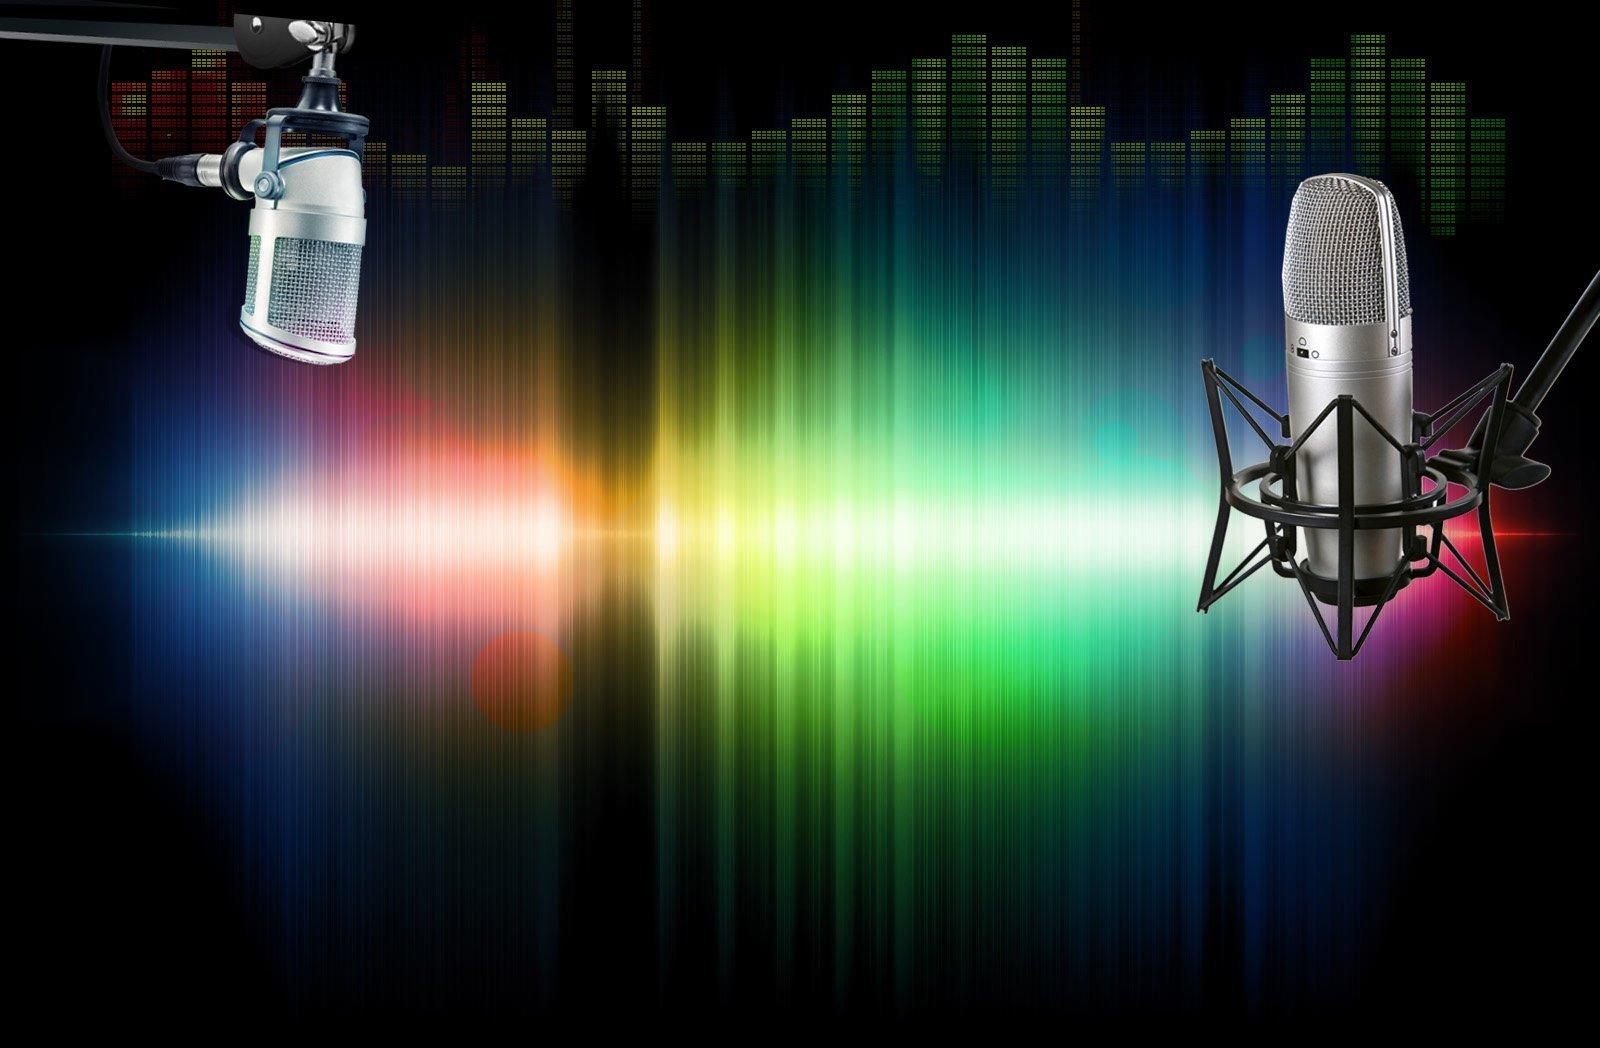 http://radioimpacto.com.ec/wp-content/uploads/2016/01/fondo-radio